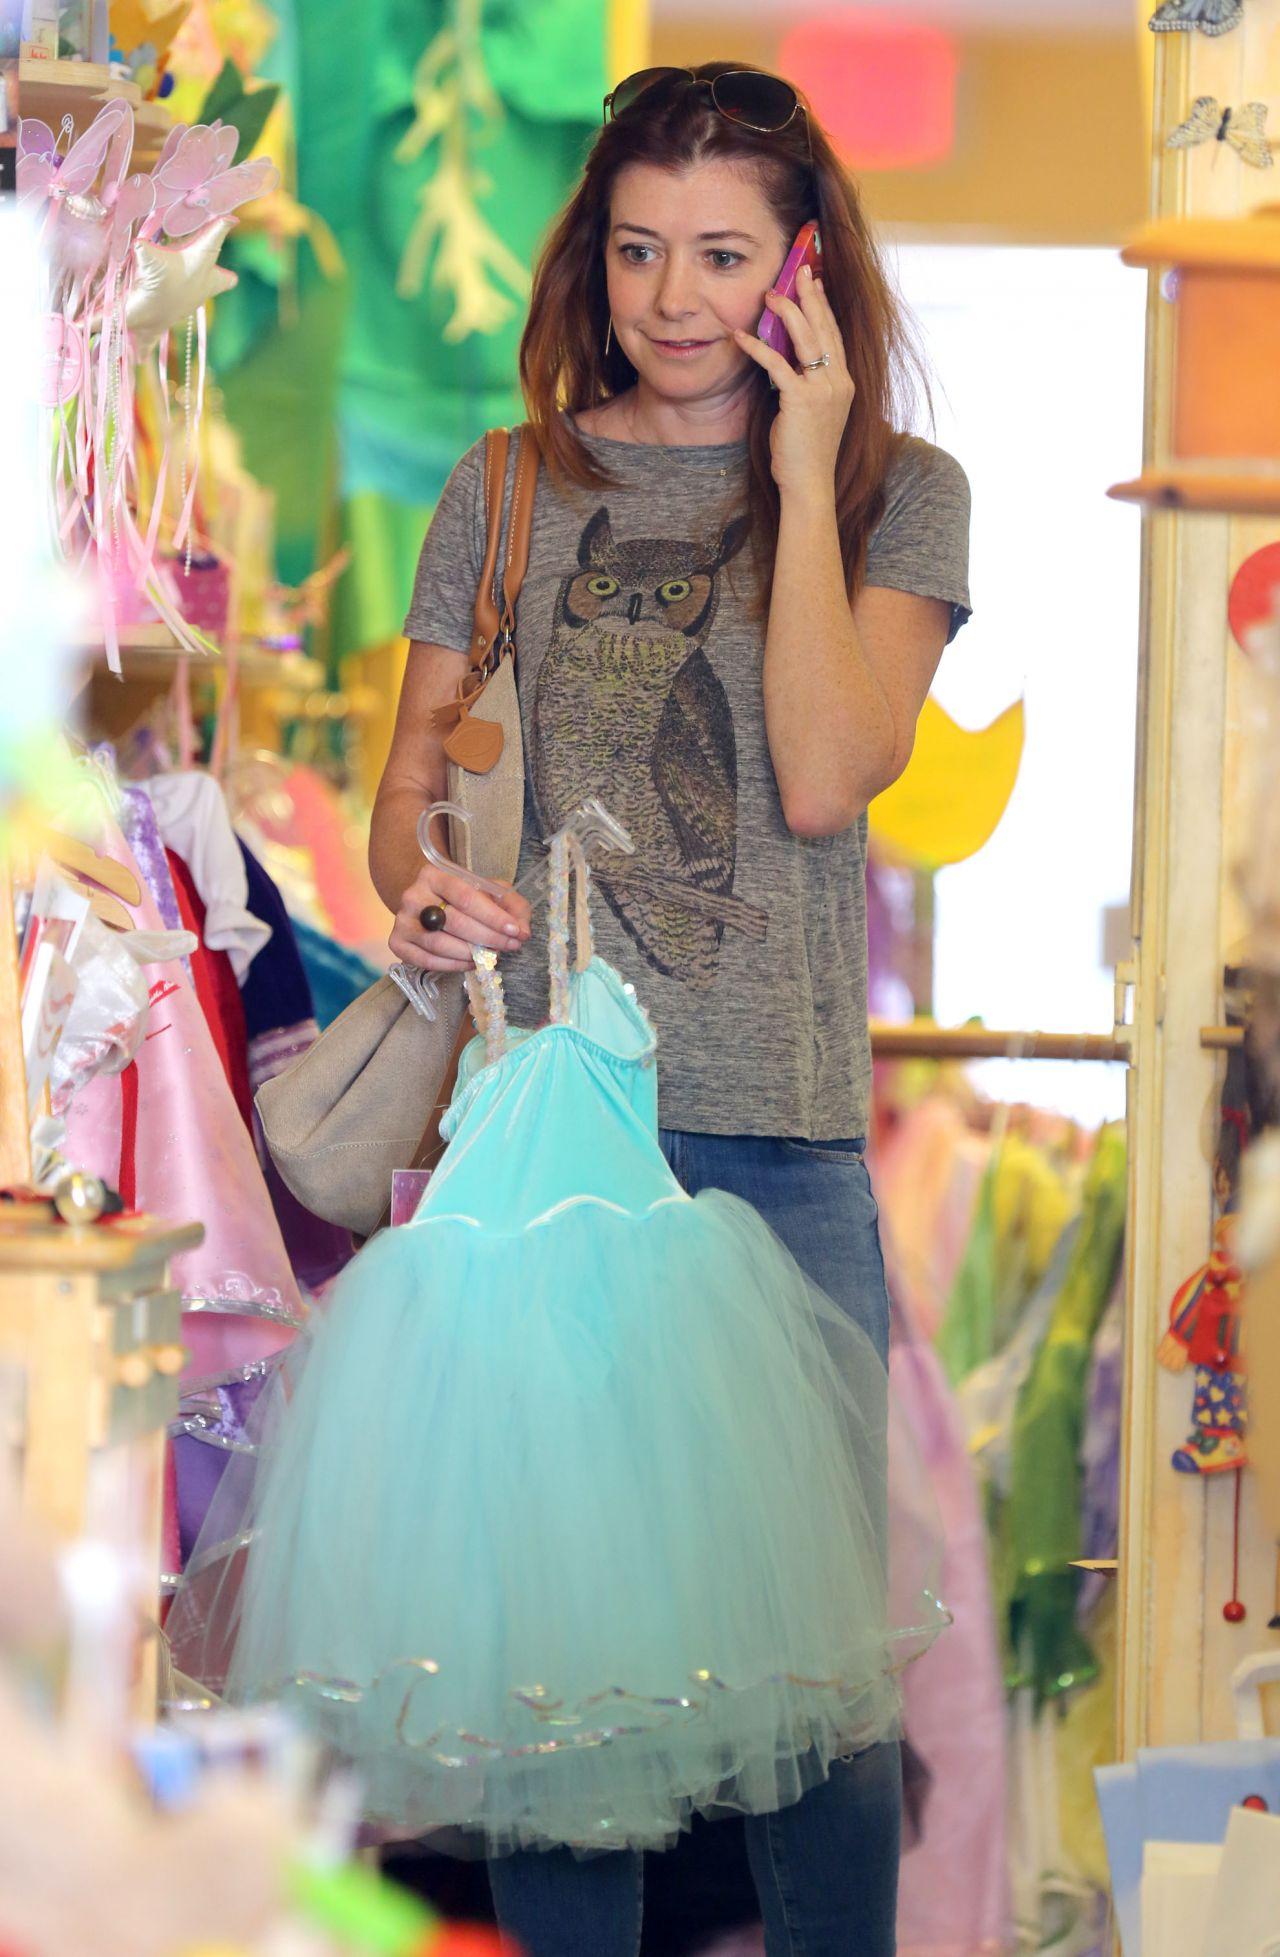 Alyson Hannigan Shops For Princess Dresses For Her